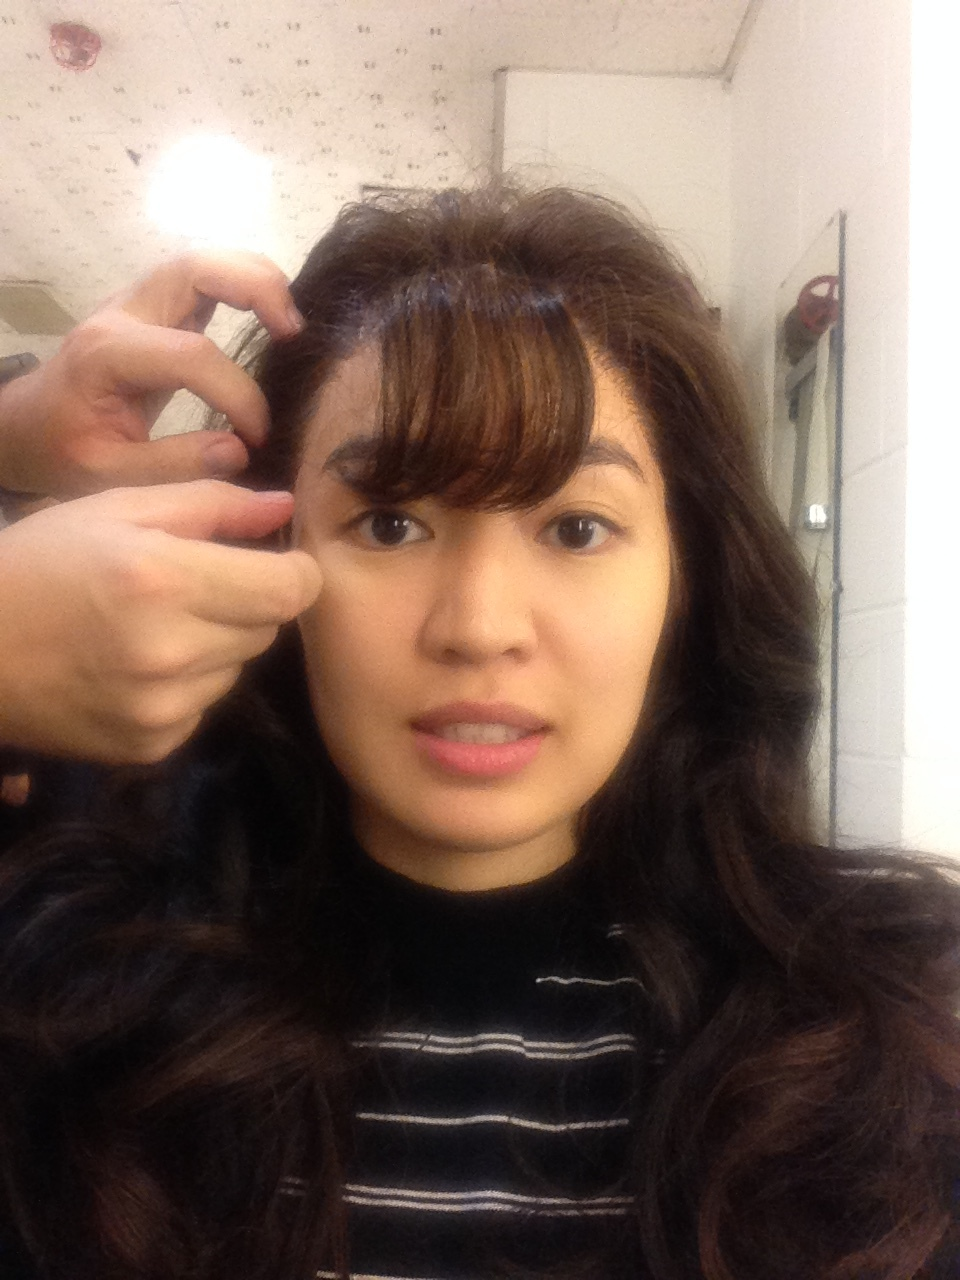 Wig and Makeup testing!